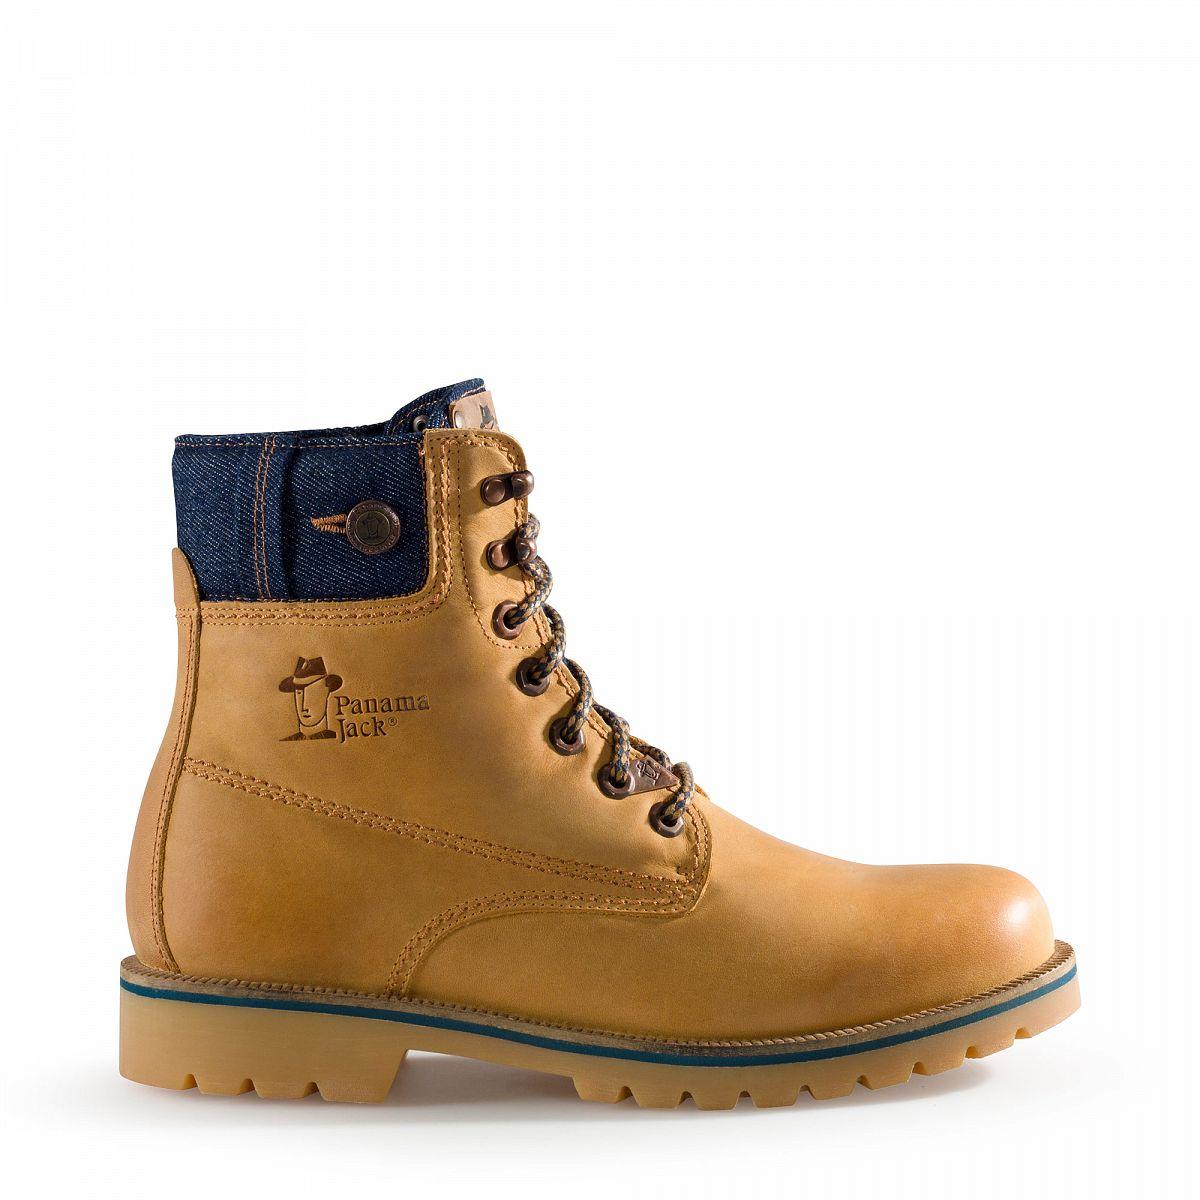 men 39 s boots panama 03 jeans vintage panama jack official store. Black Bedroom Furniture Sets. Home Design Ideas